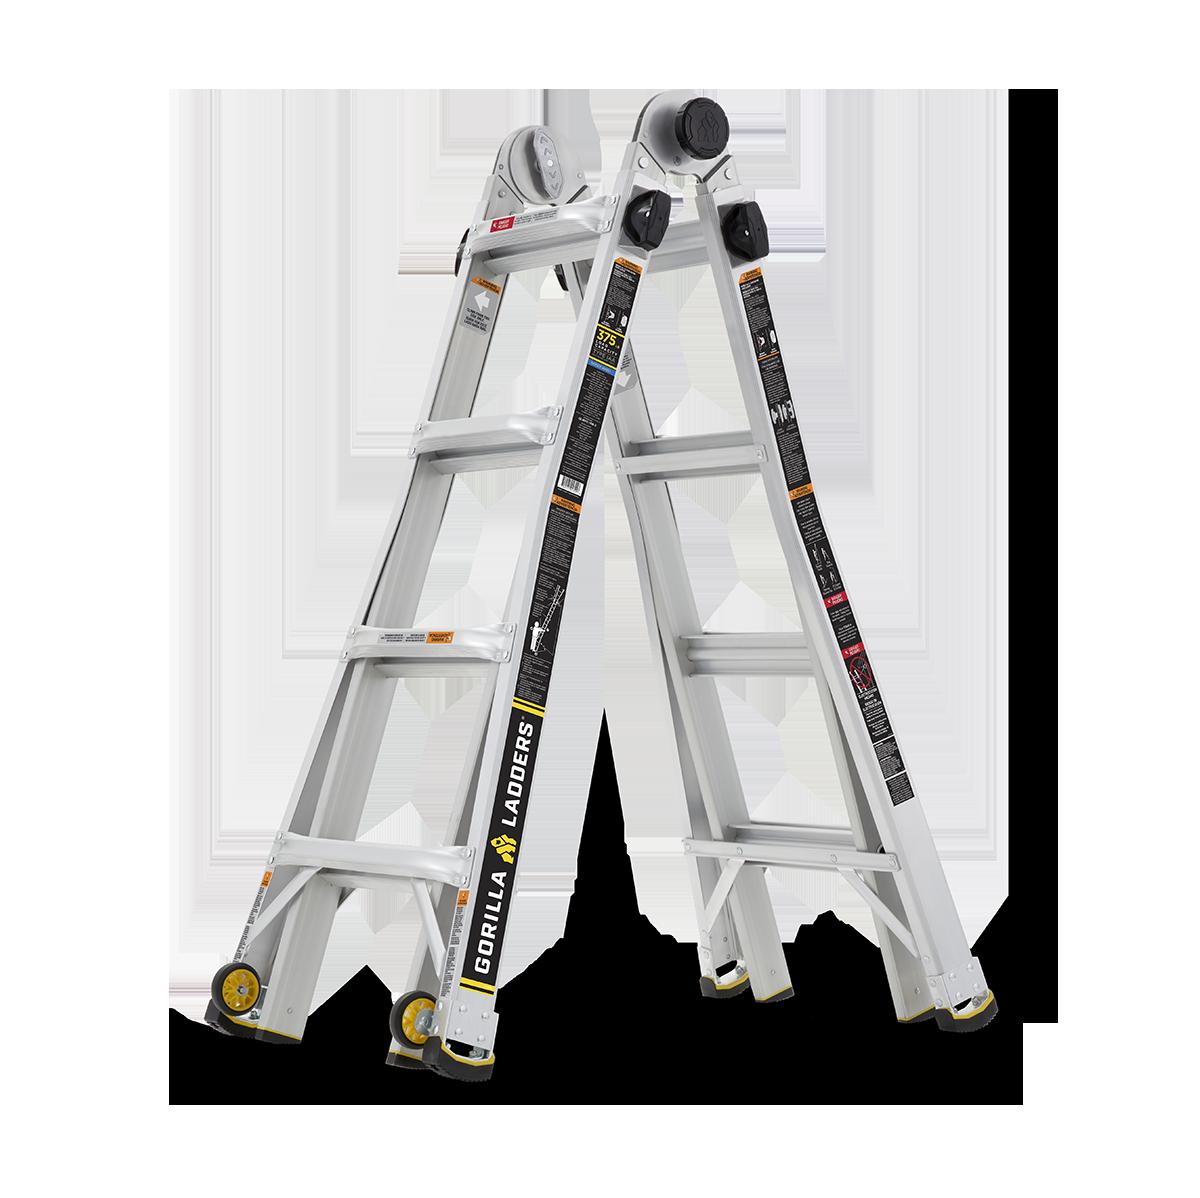 Gorilla Laddersglmpx 18w 2 Gorilla Ladders